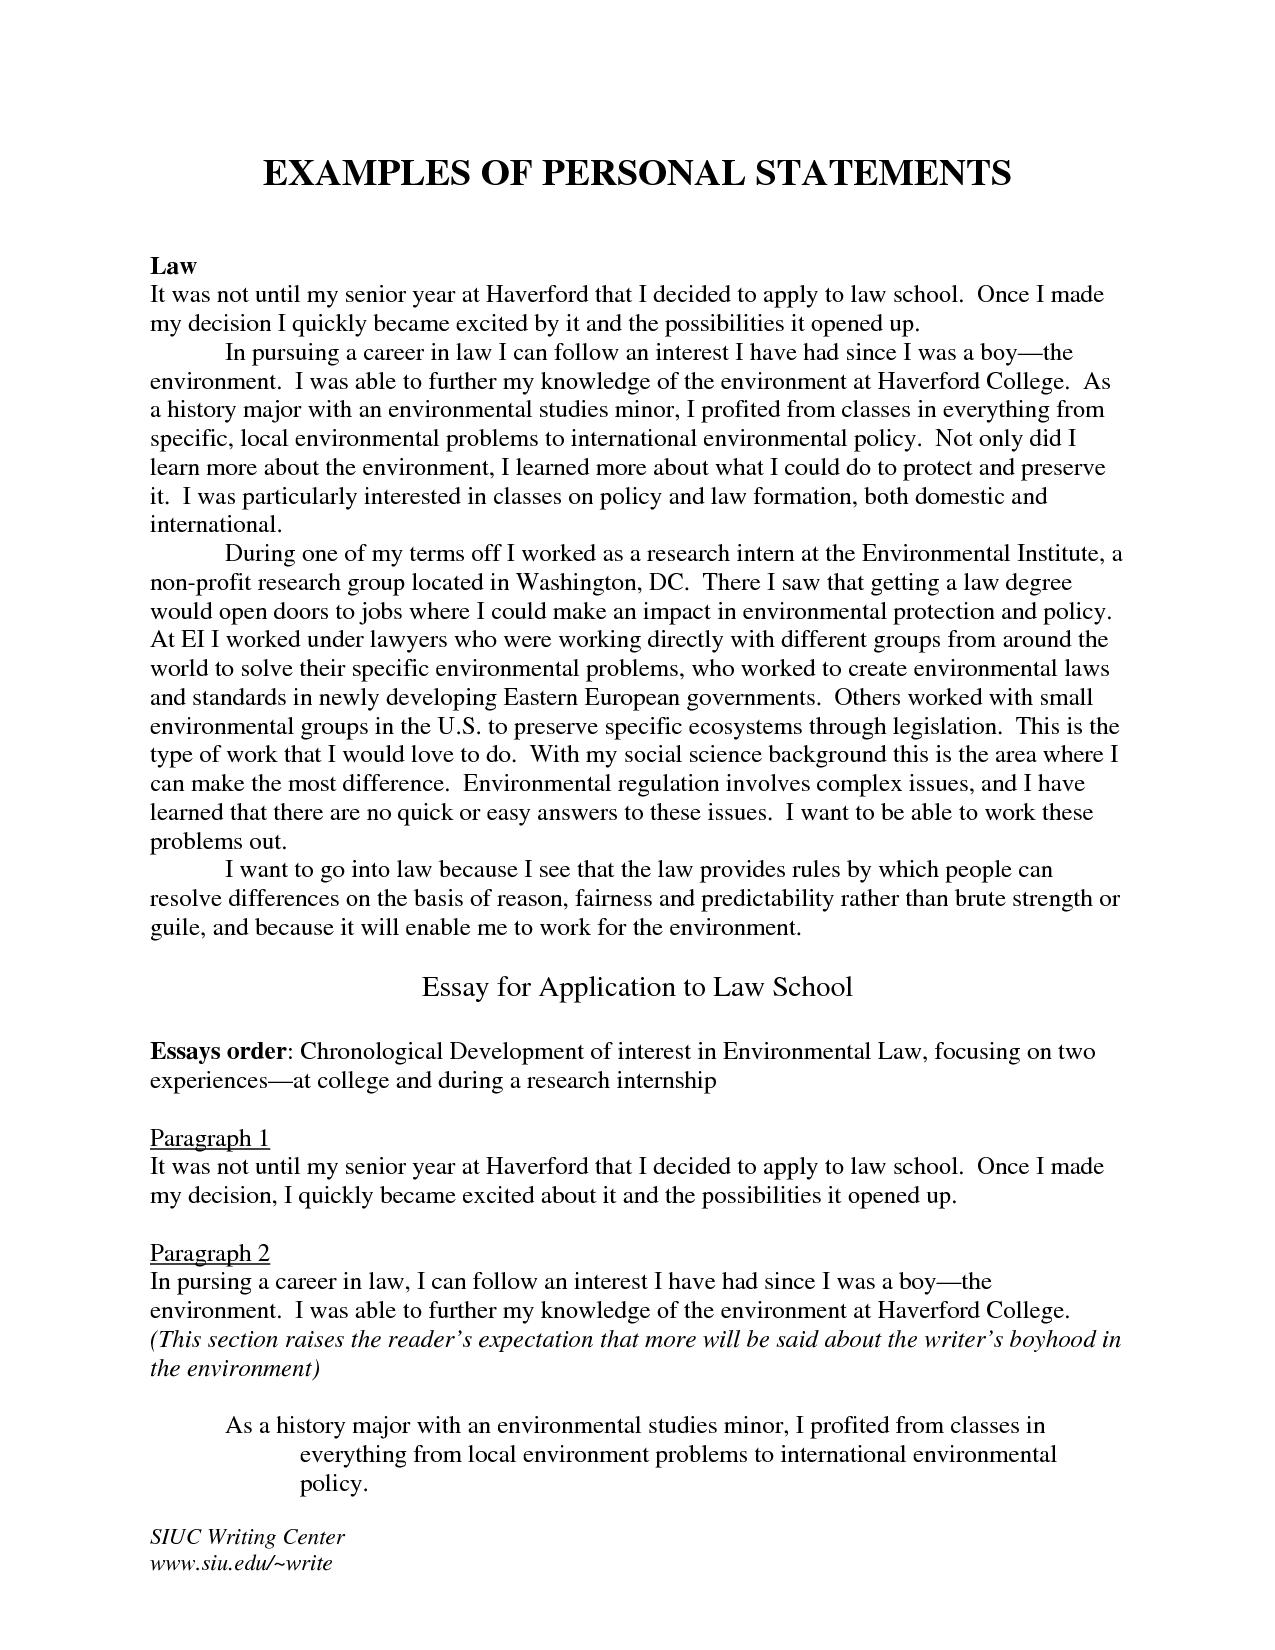 013 Statement Of Purpose Sample Essays Essay Fearsome Graduate School Education Psychology Mba Full